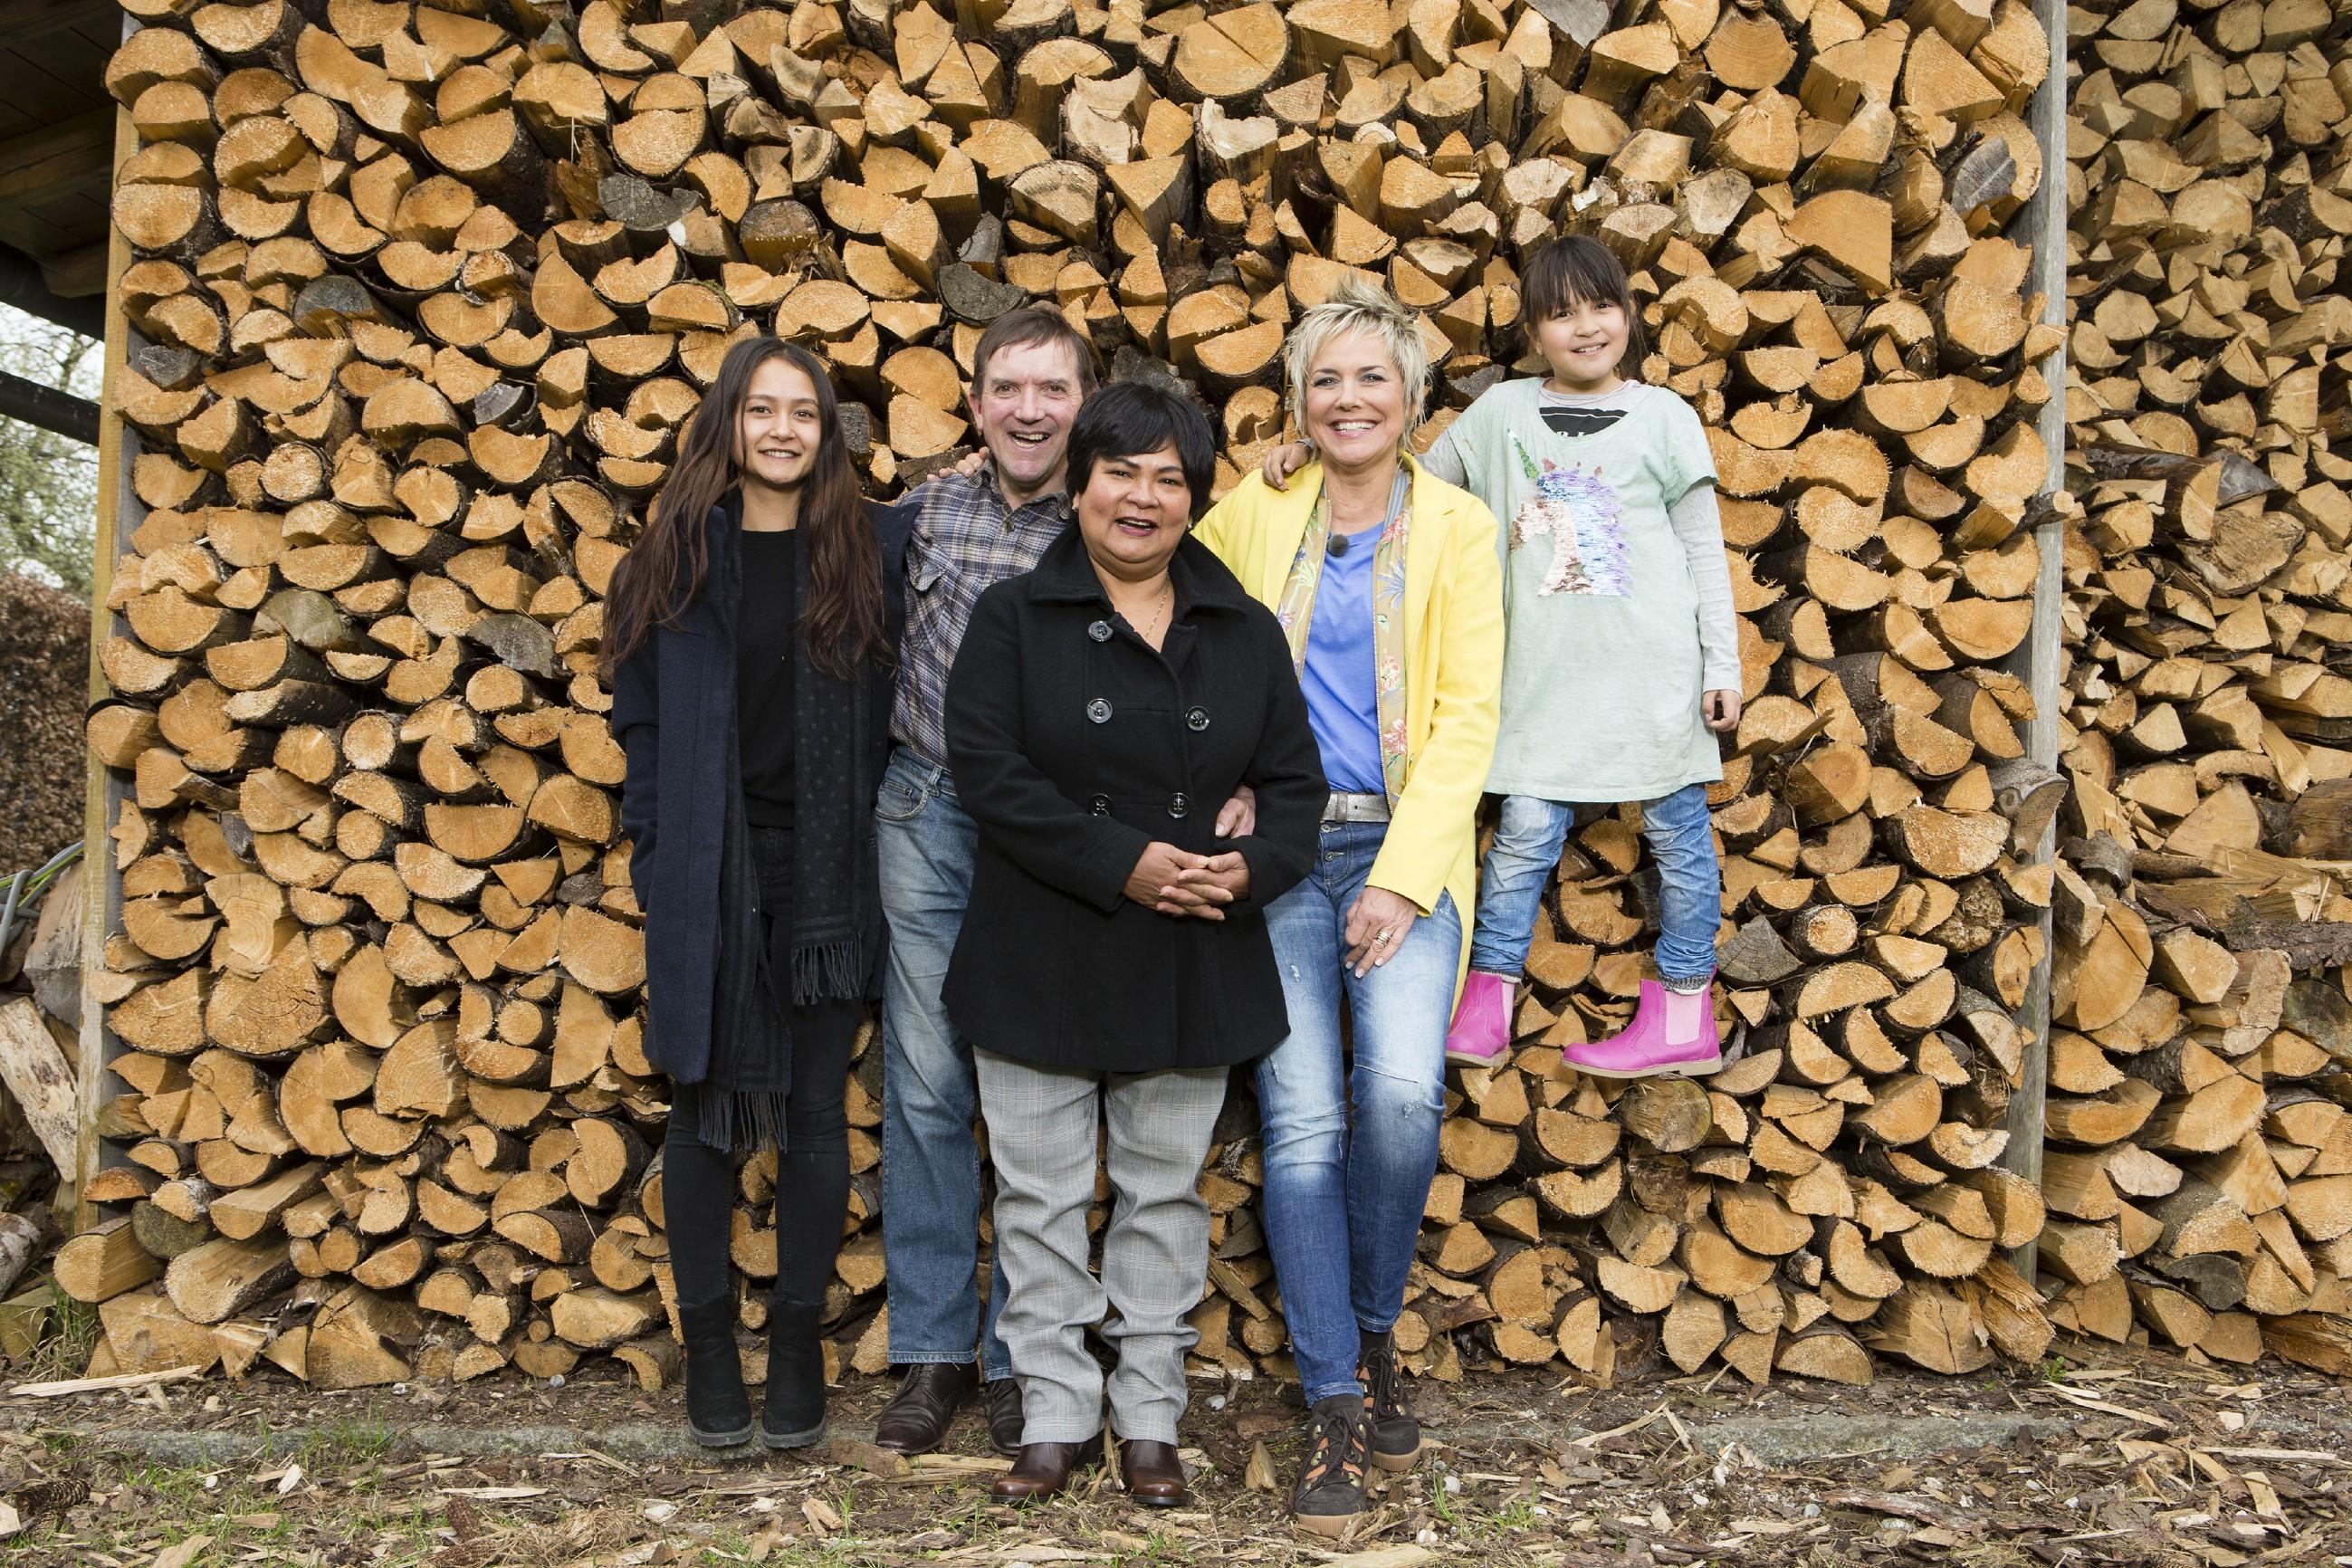 Josef & Narumol Spezial - Moderatorin Inka Bause mit Jenny, Josef, Narumol und Jorafina